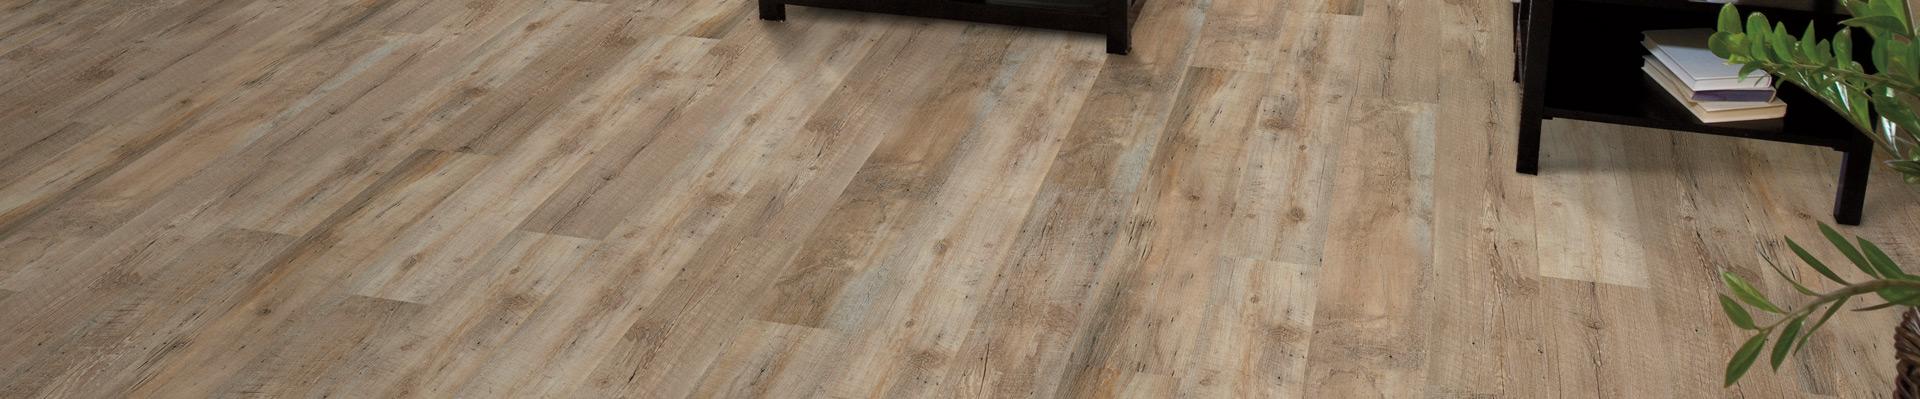 Dale S Carpet Amp Design Carpet Flooring Red Bluff Ca